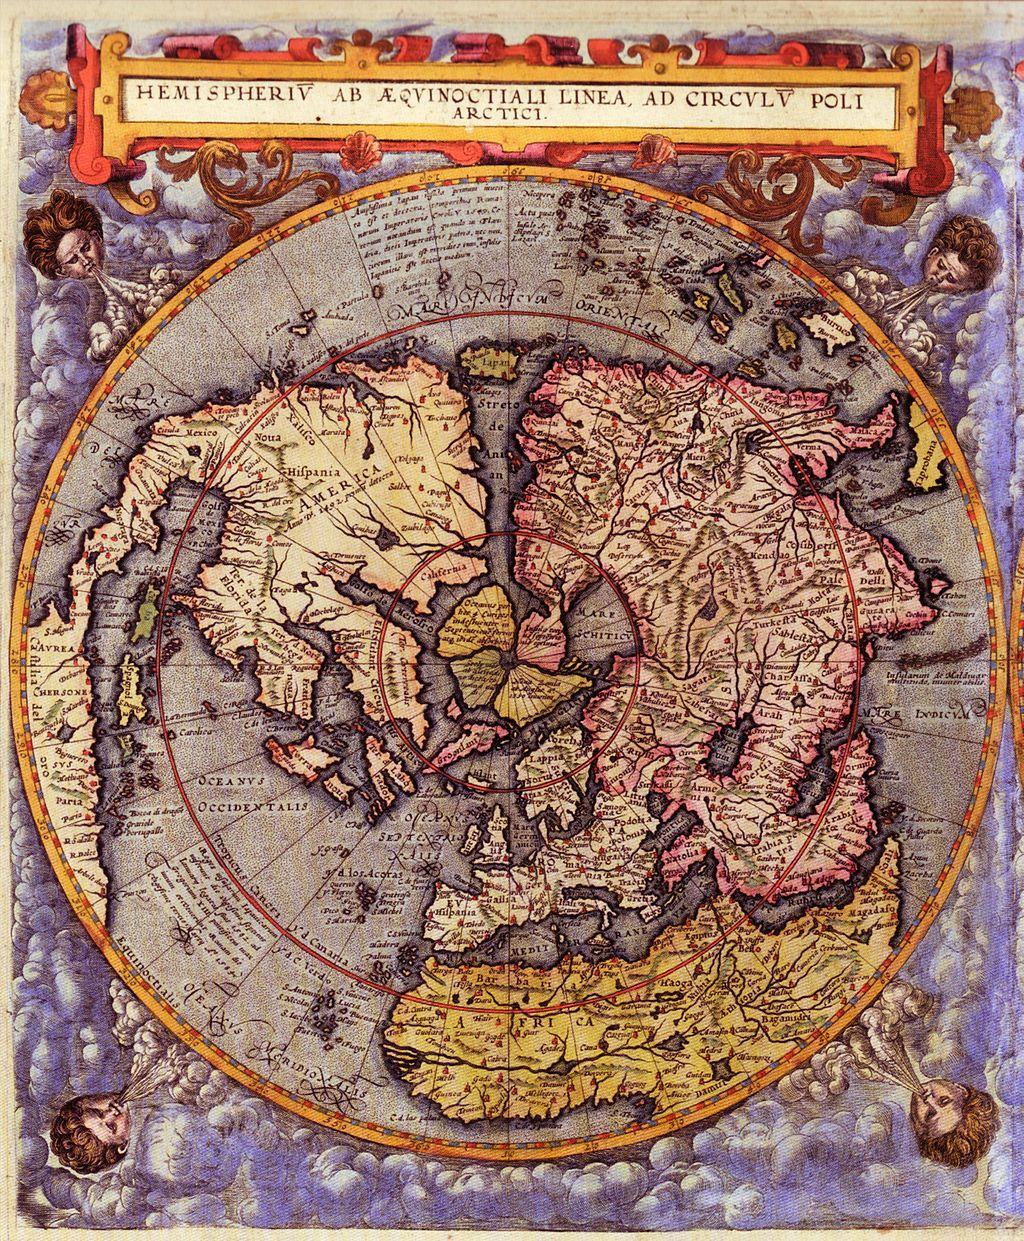 1024px-Gerard_de_Jode_1593_Map_Northern_hemisphere